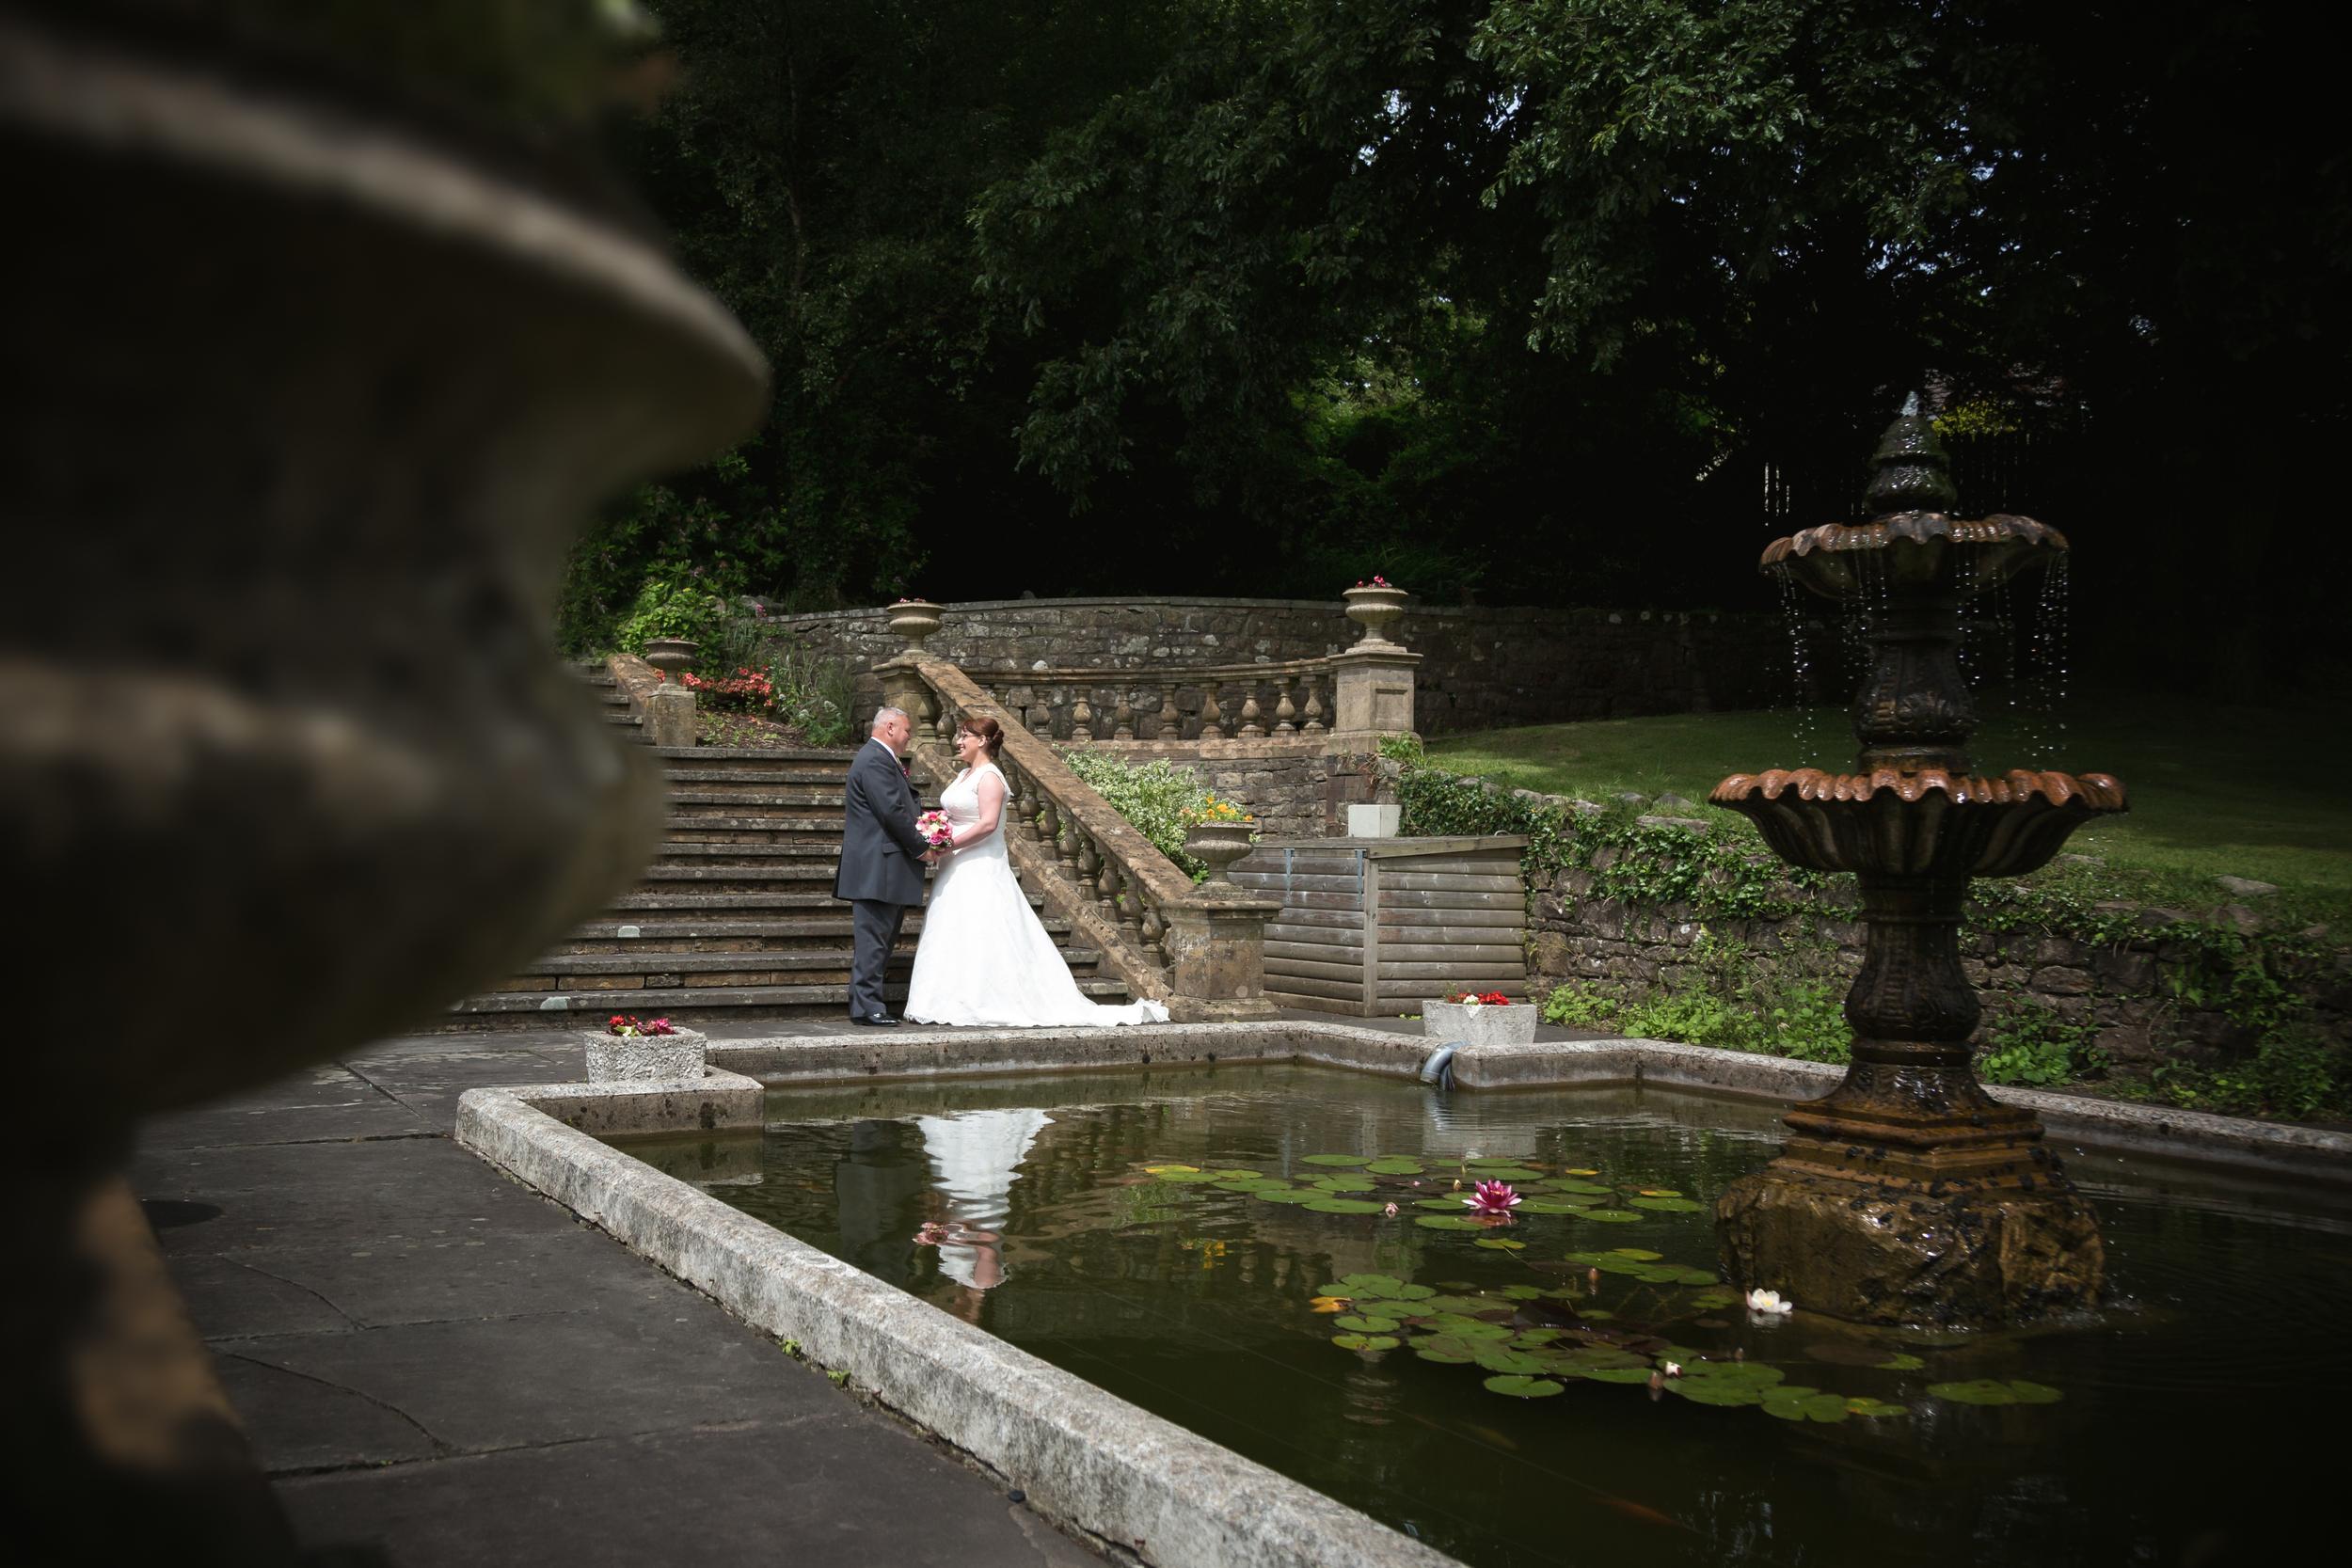 Court Coleman Wedding Photographer. wedding photographer Bridgend, Caerphilly, Cardiff, South Wales